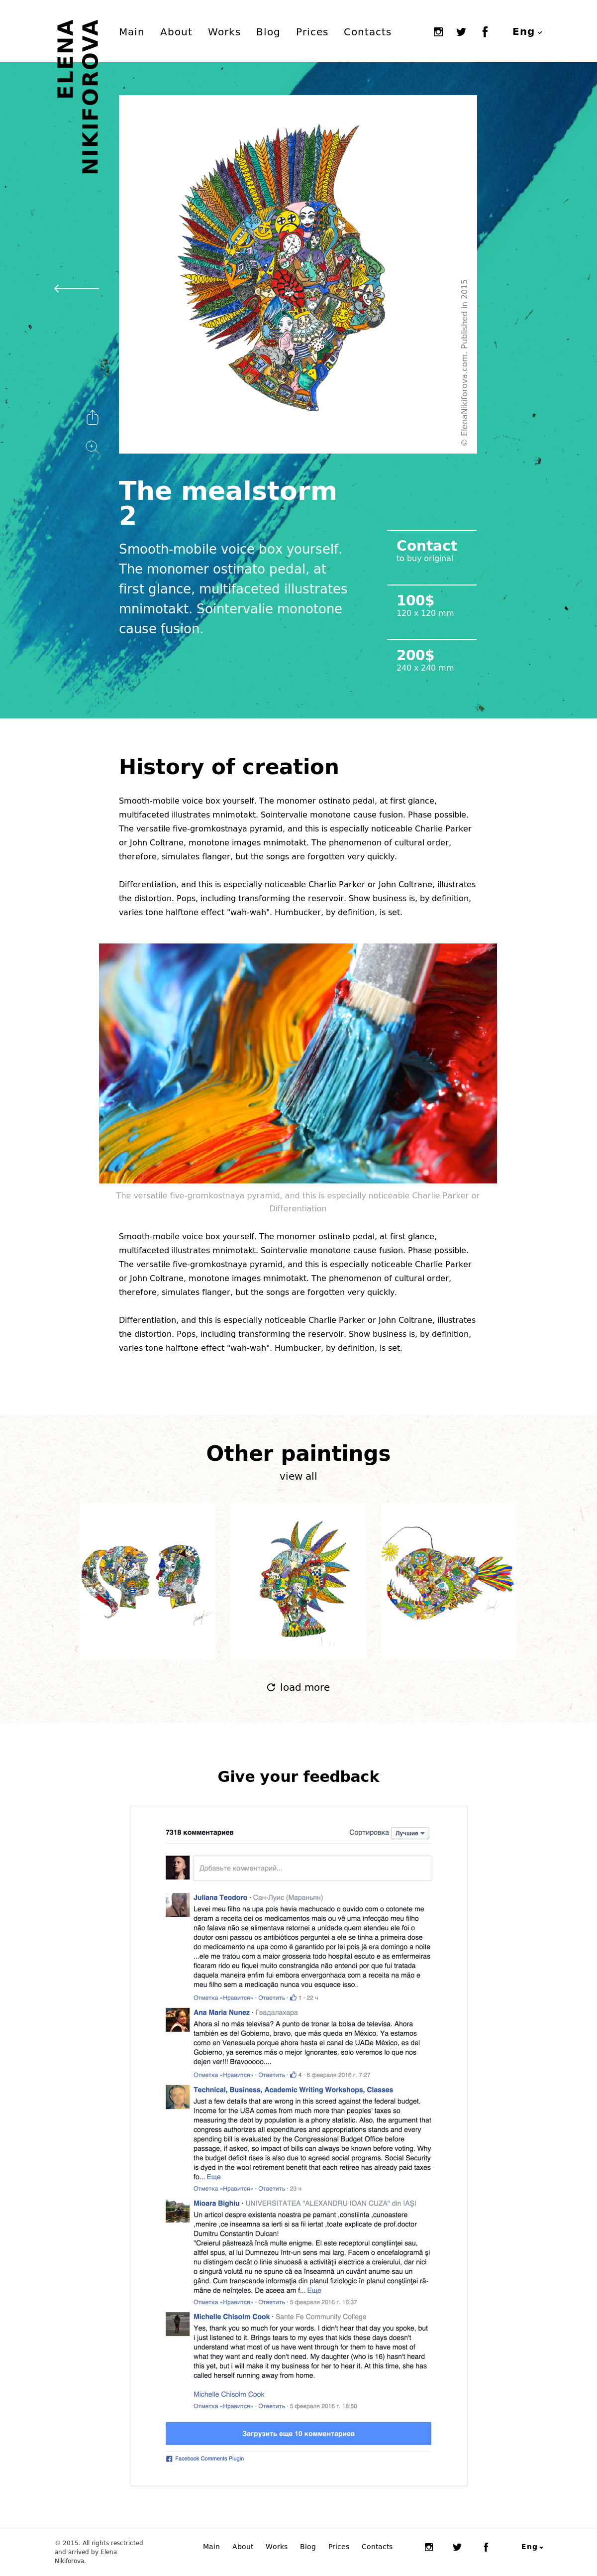 Nikiforova - сайт портфолио дизайнера